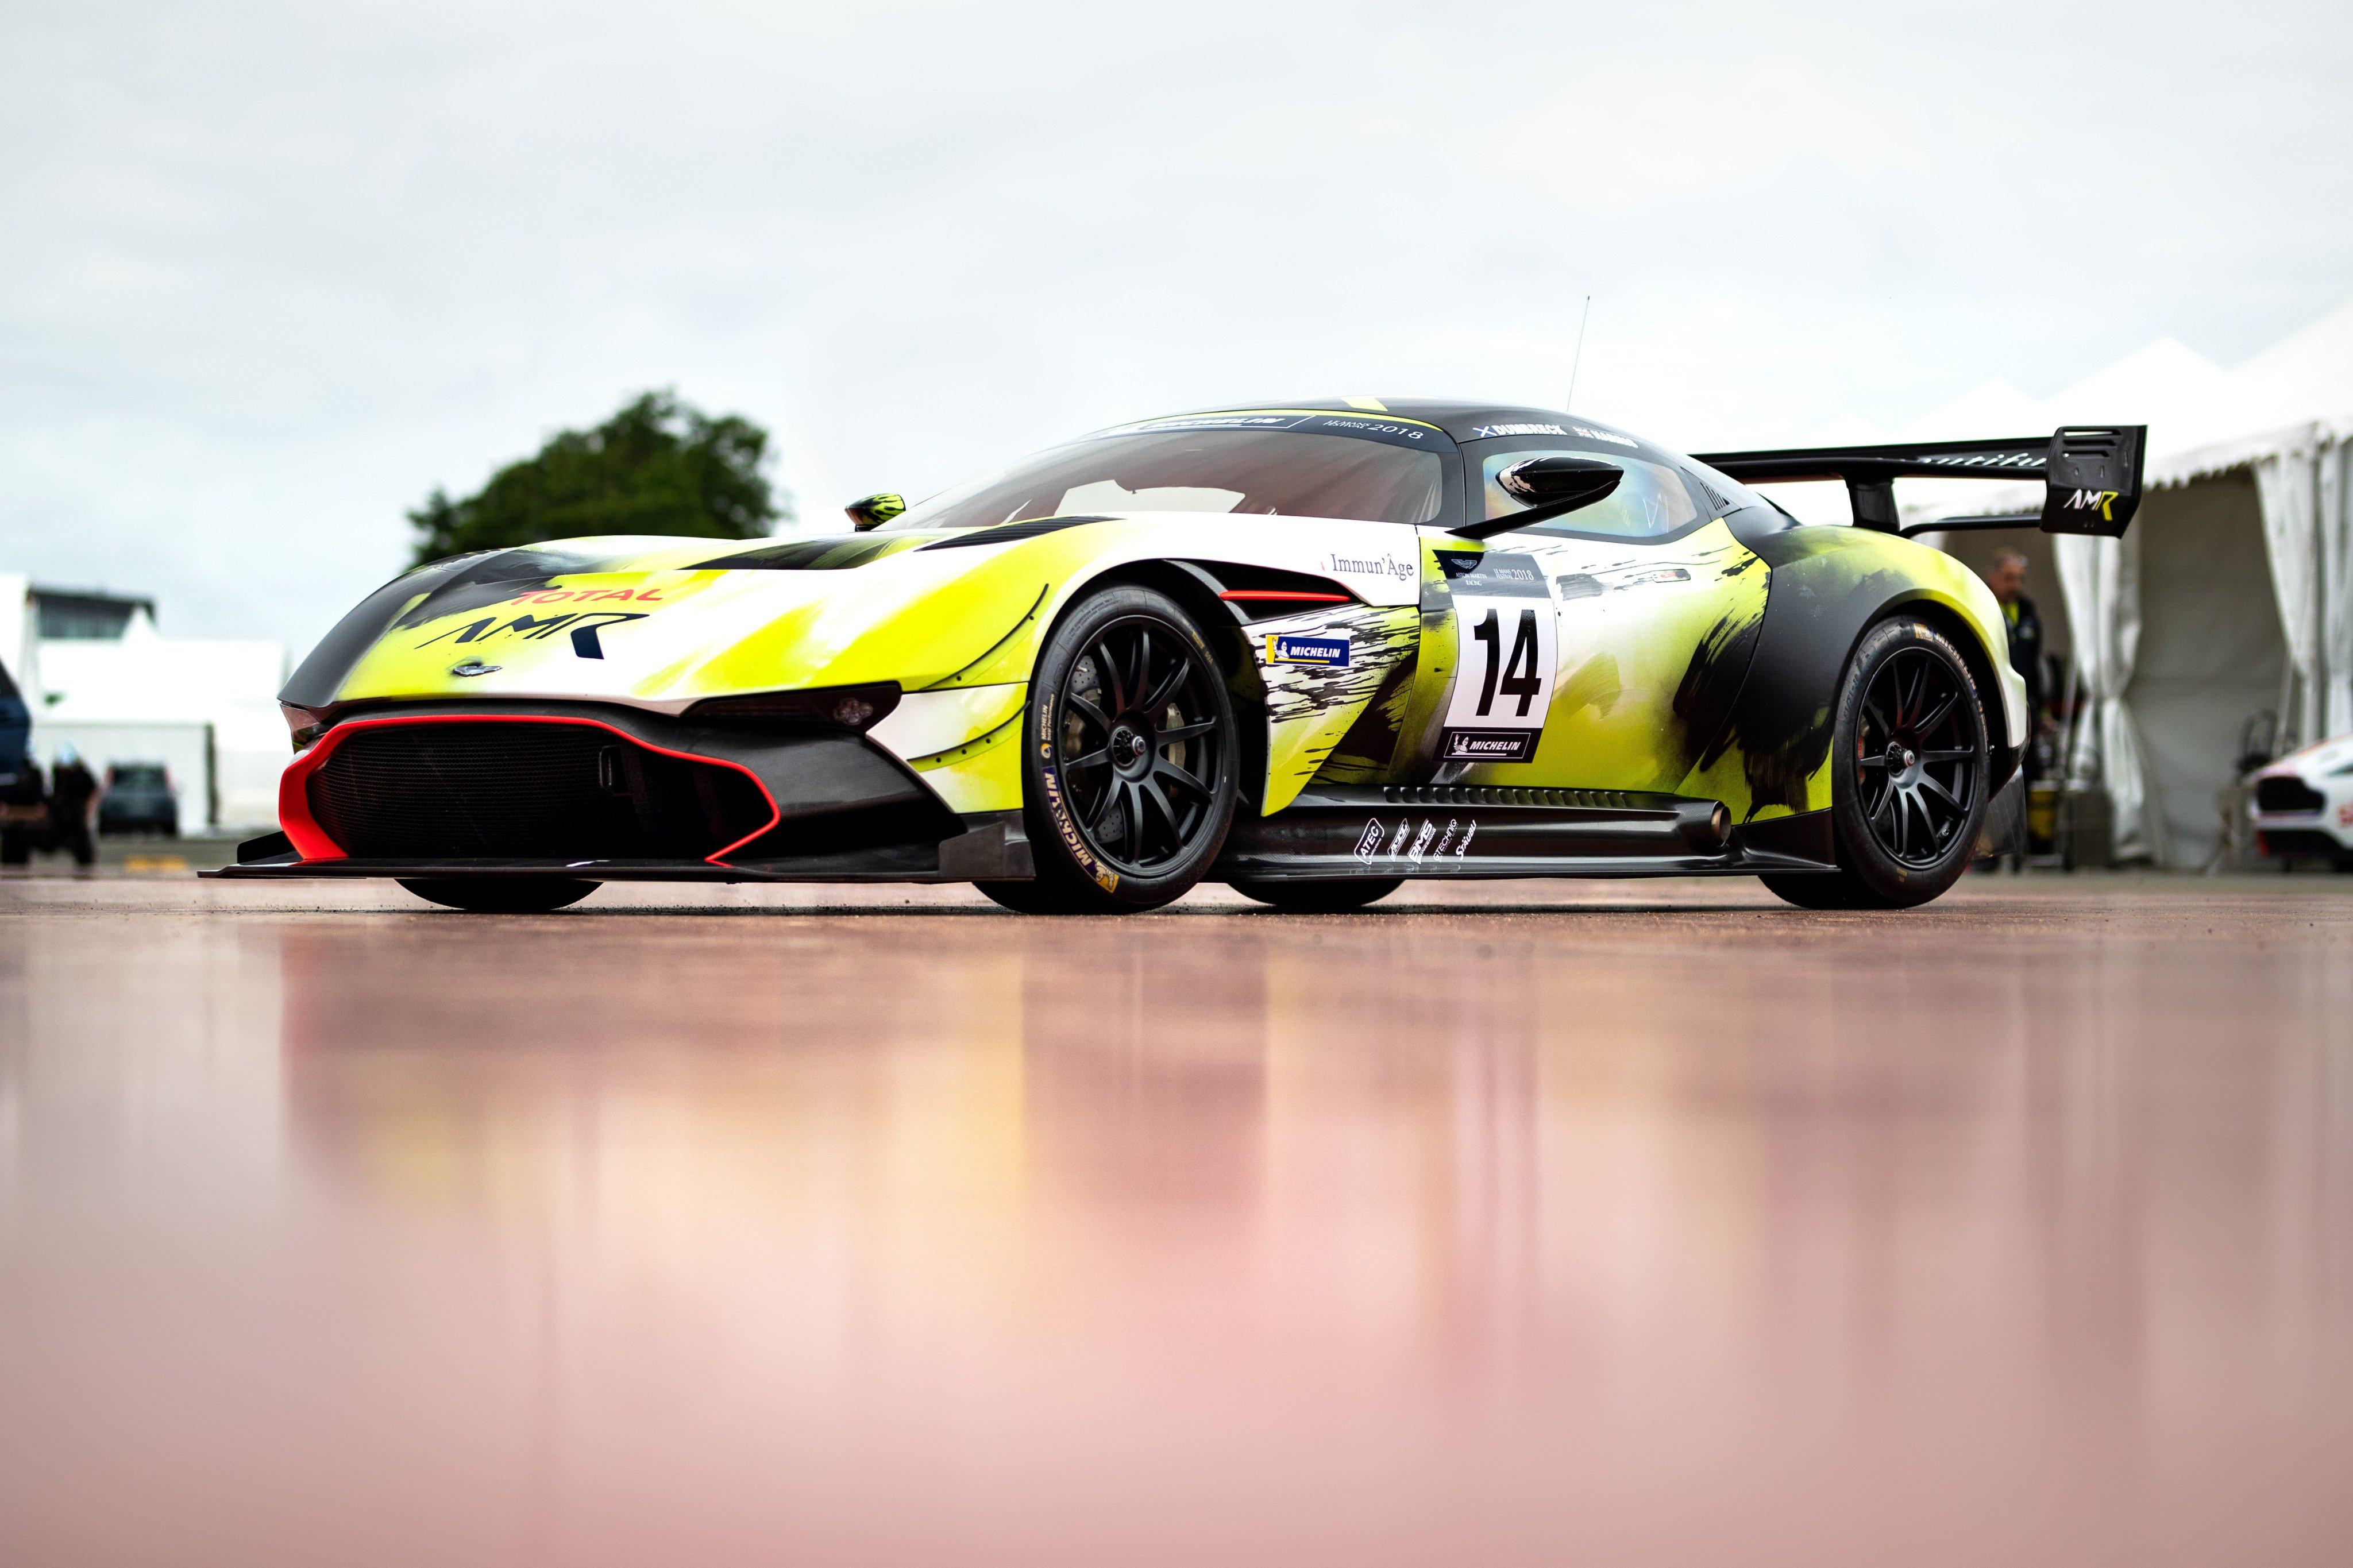 Semi Ot Aston Martin Vulcan Of Chris Harris And Peter Dumbreck That Will Race In Aston Martin Festival Wec